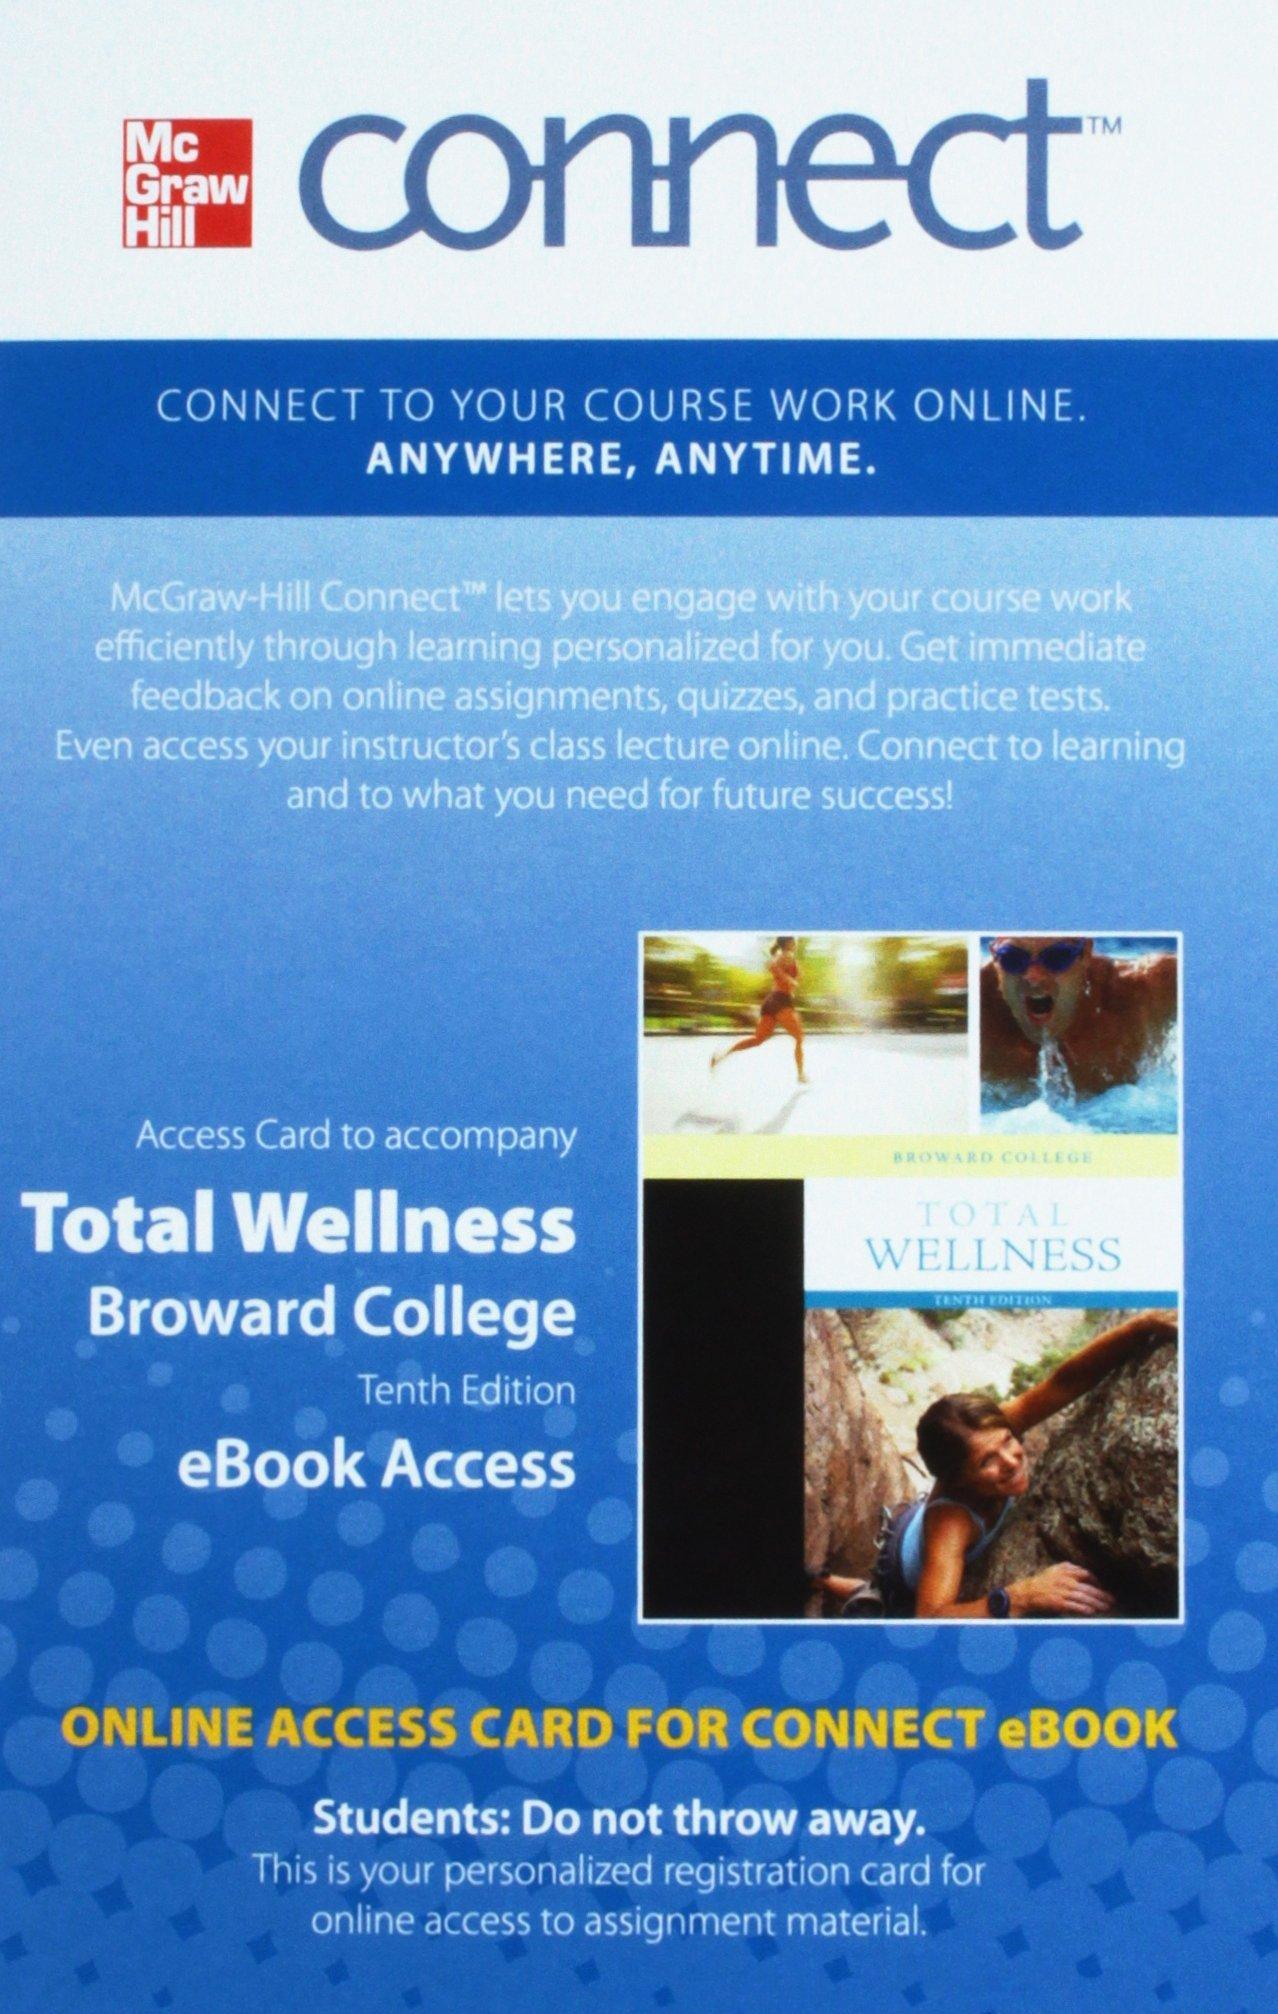 Total Wellness Broward College 10th Edition eBook Access: Amazon.com: Books